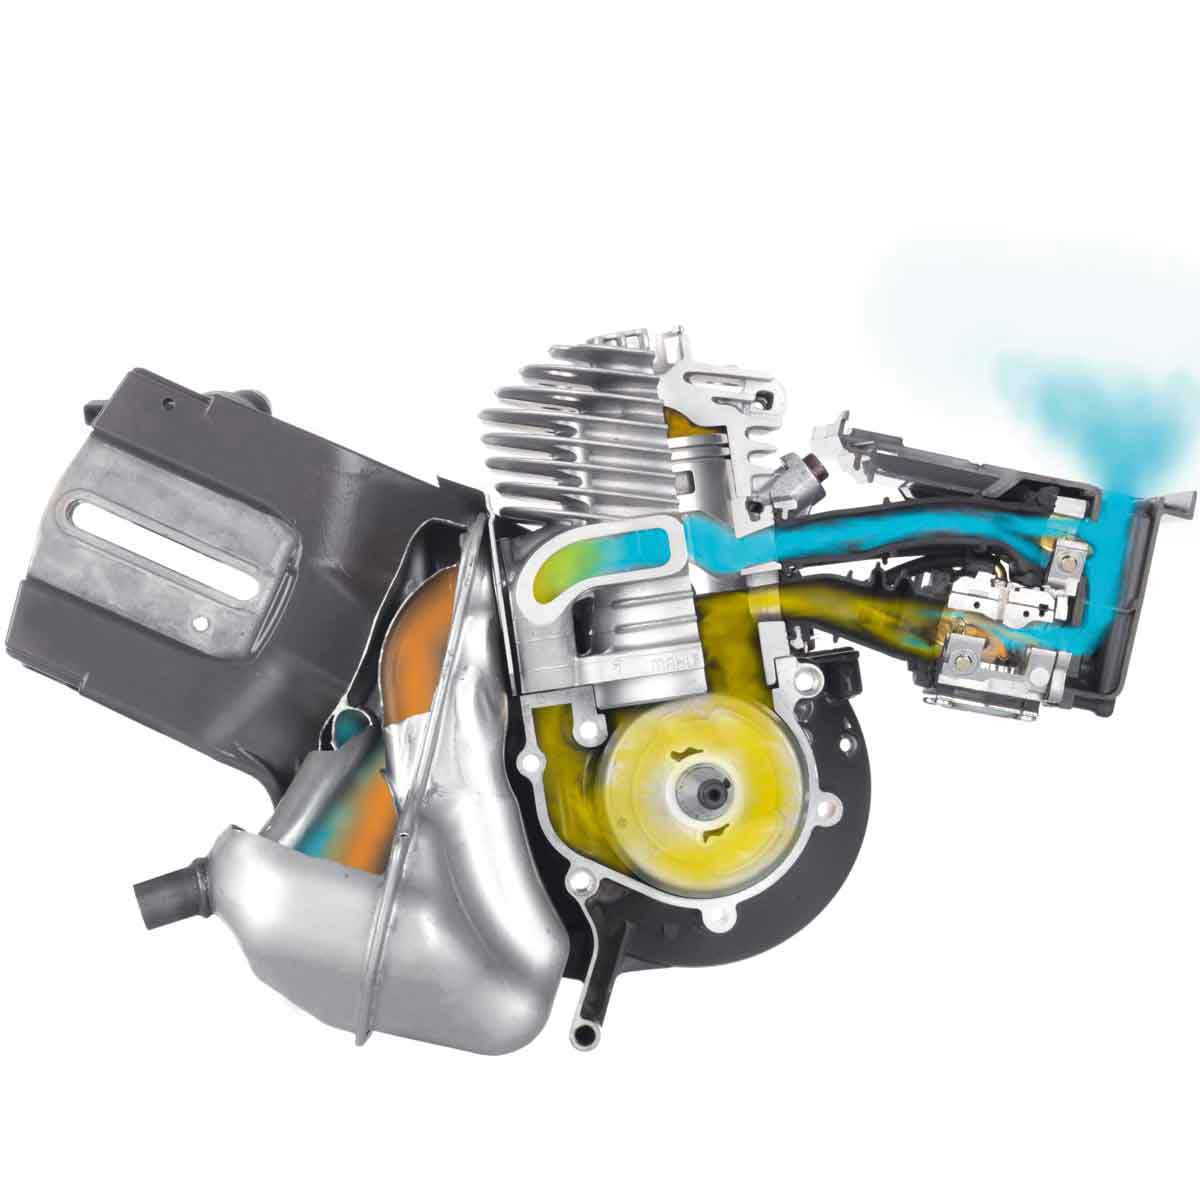 k760 power cutter, husqvarna